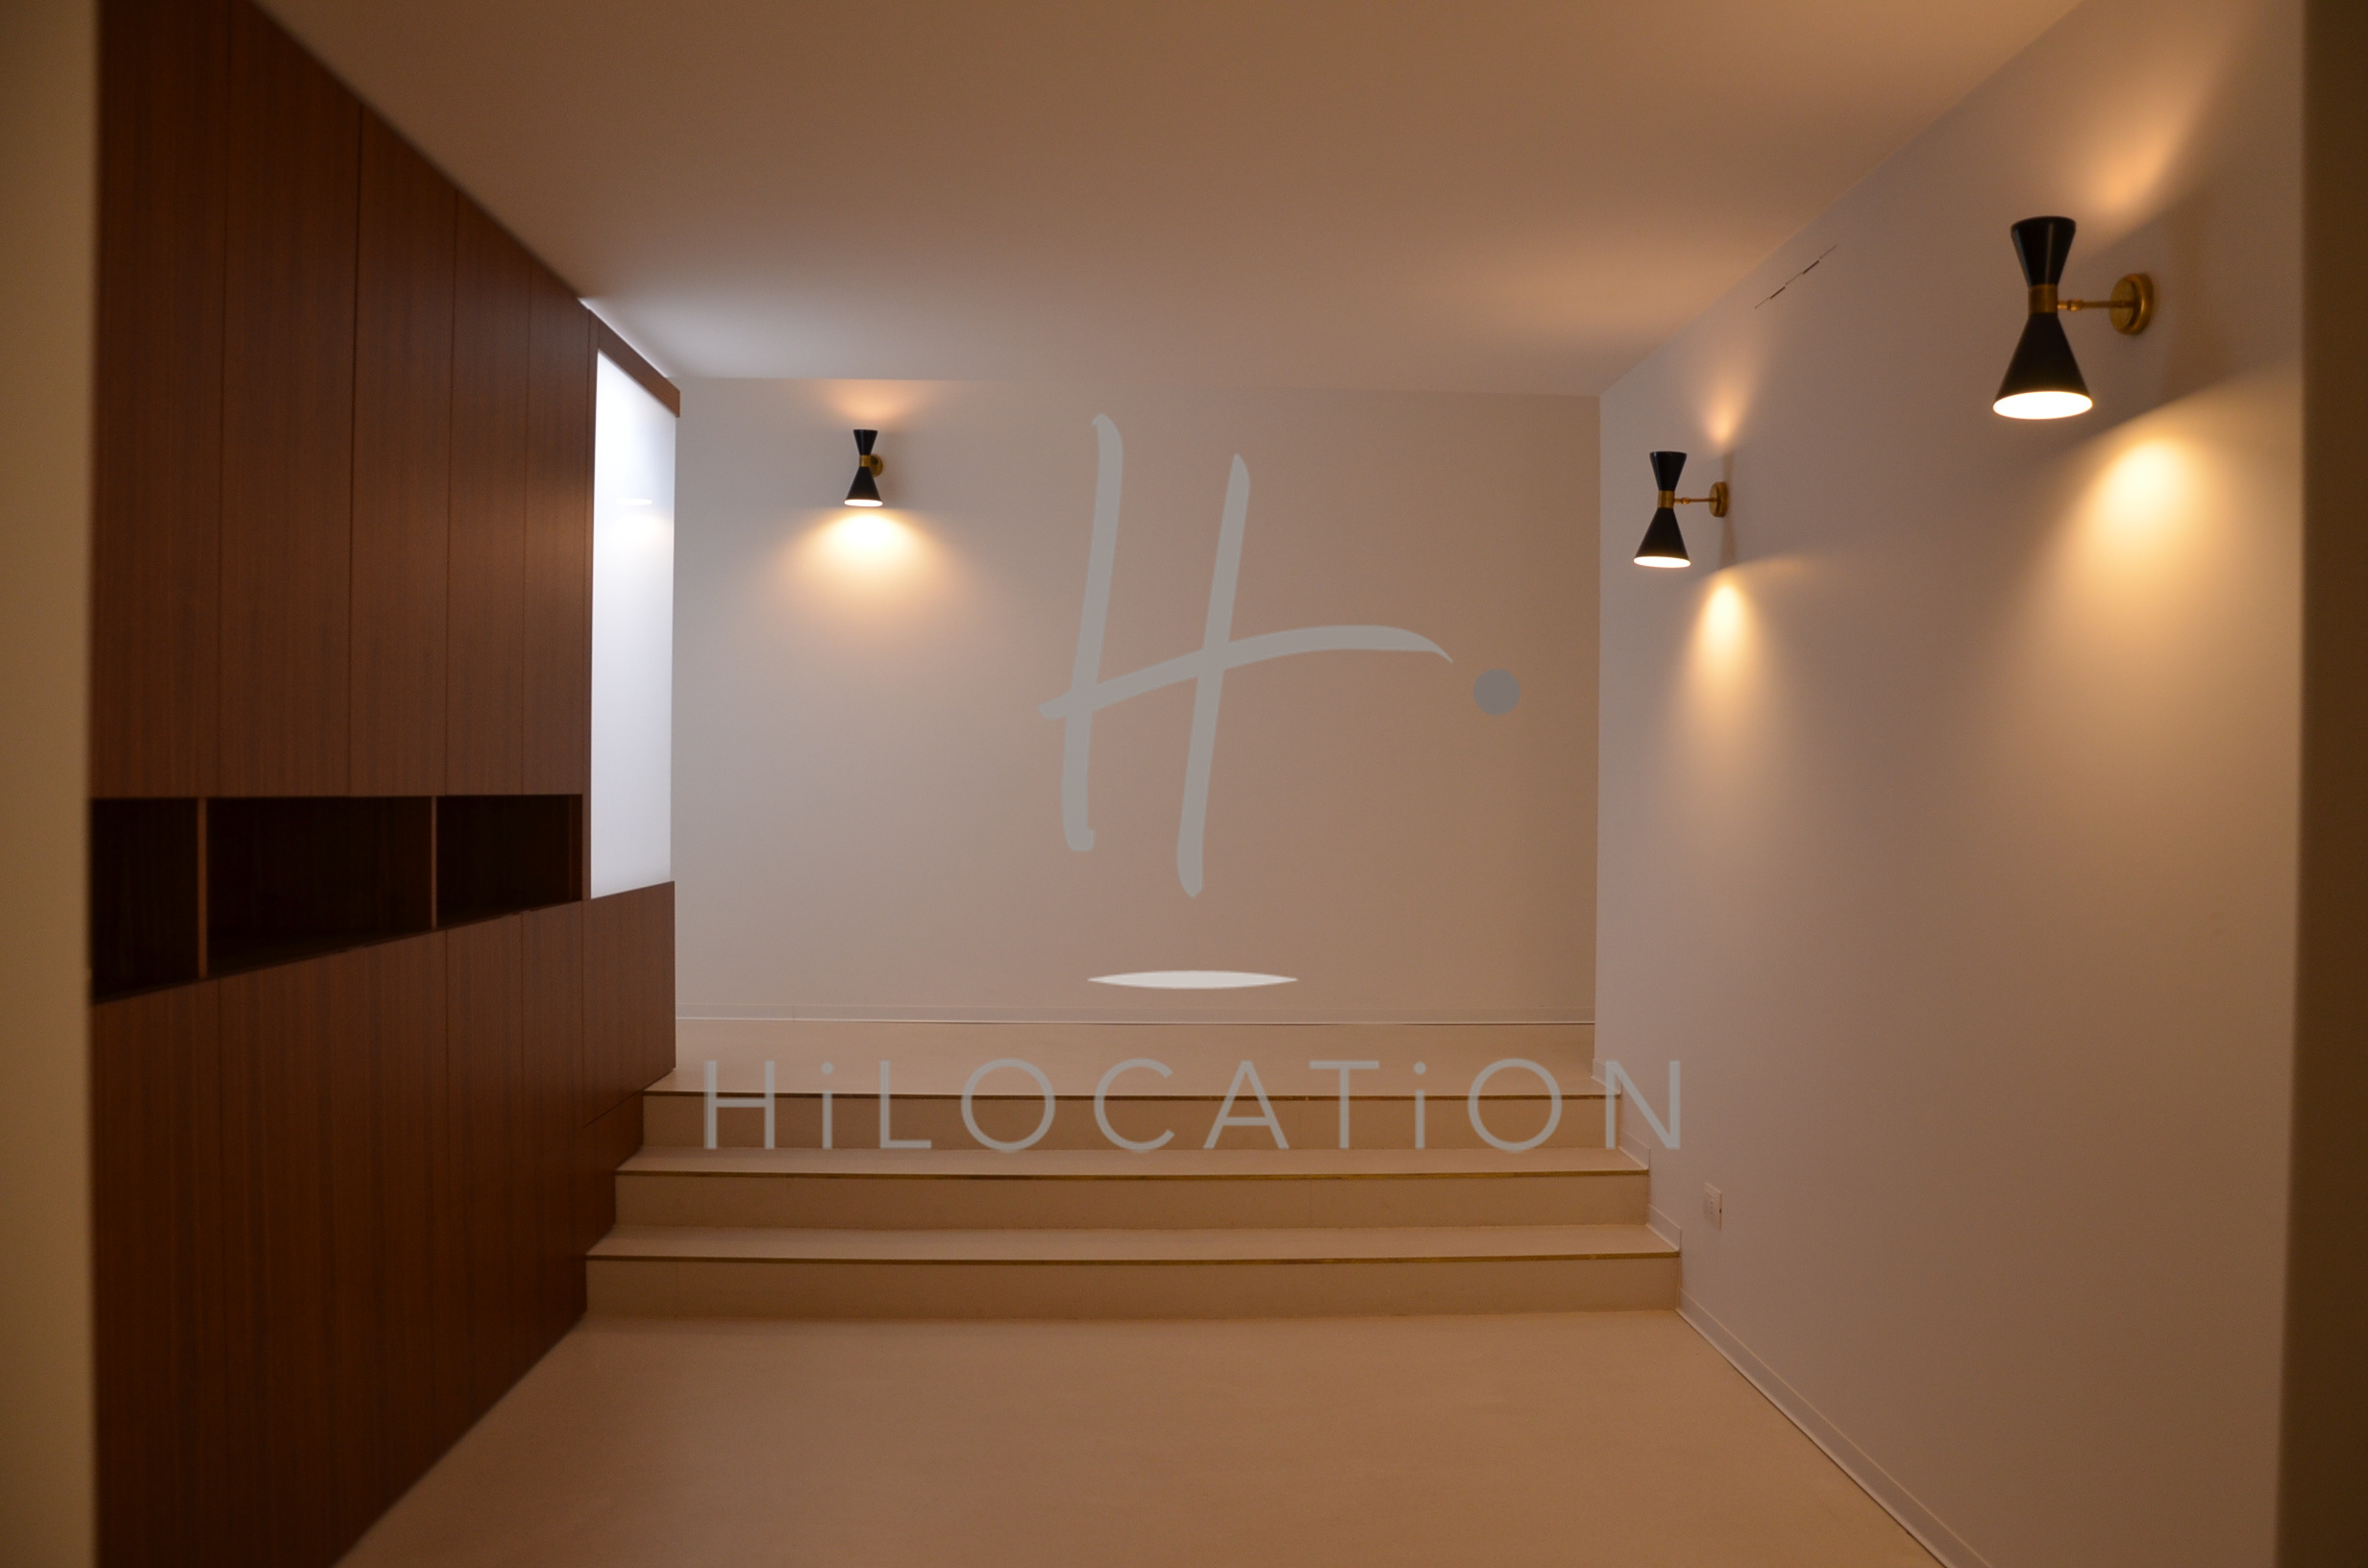 Hh420 (43)